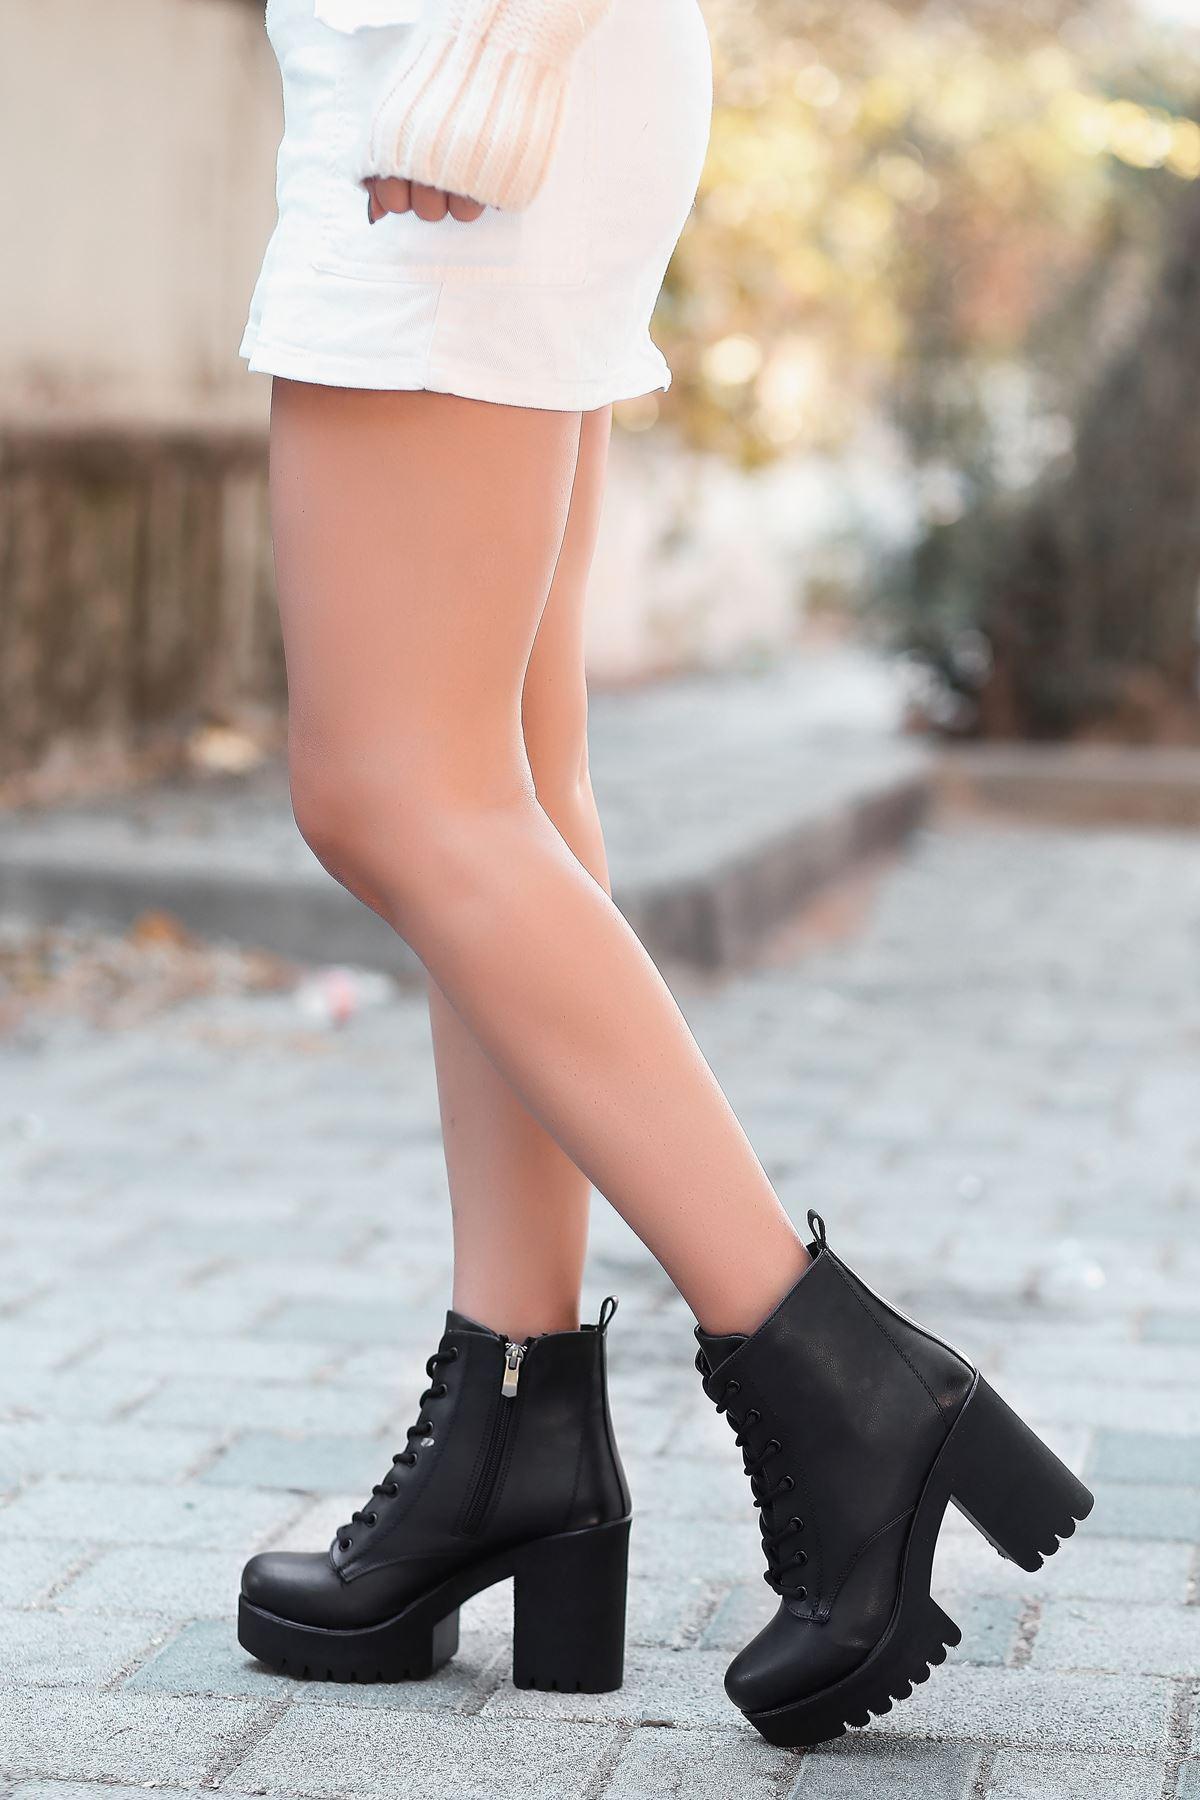 Andy Mat Deri Bağcık Detaylı Kalın Topuklu Bot Siyah